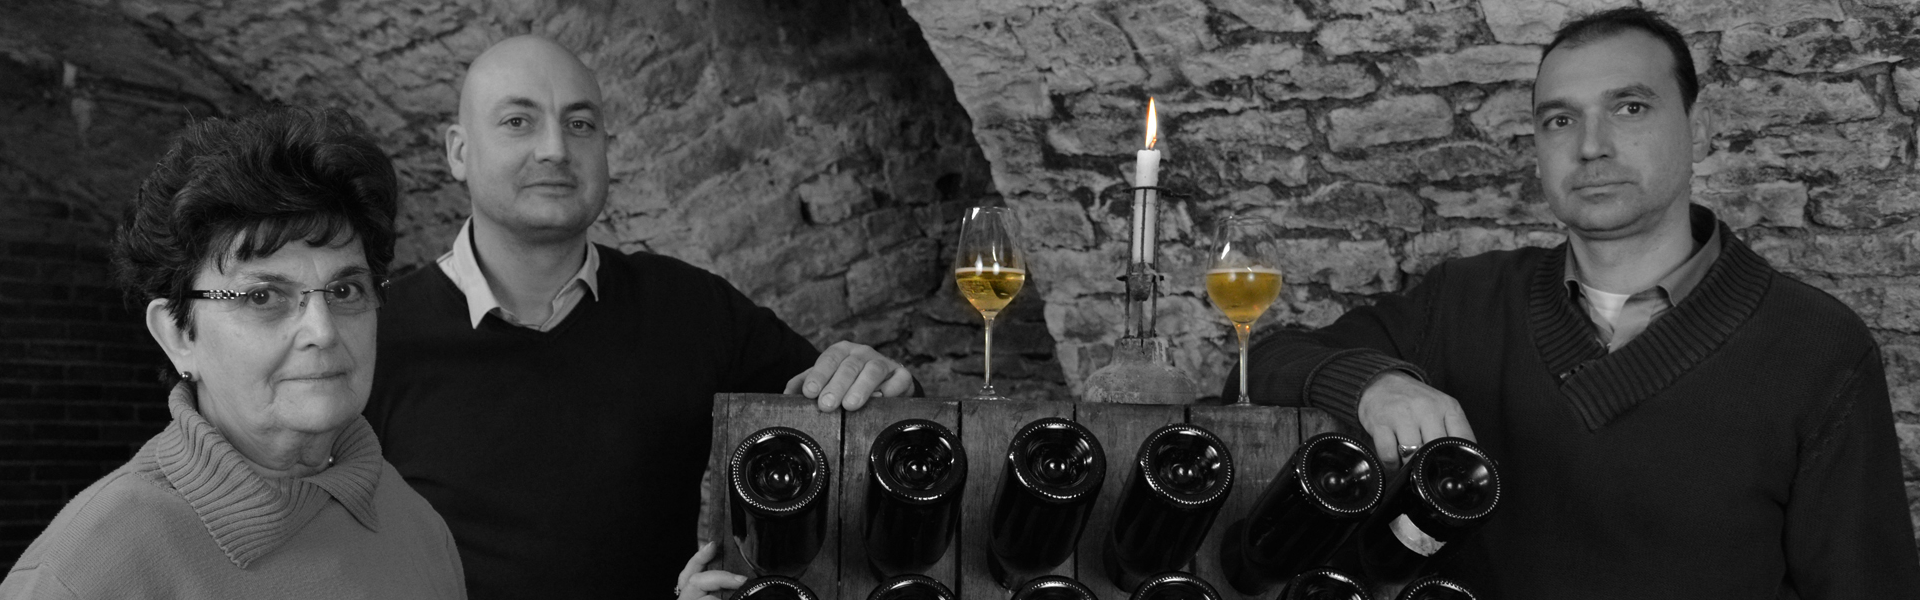 champagne-dautel-cadot-histoire-slider-3